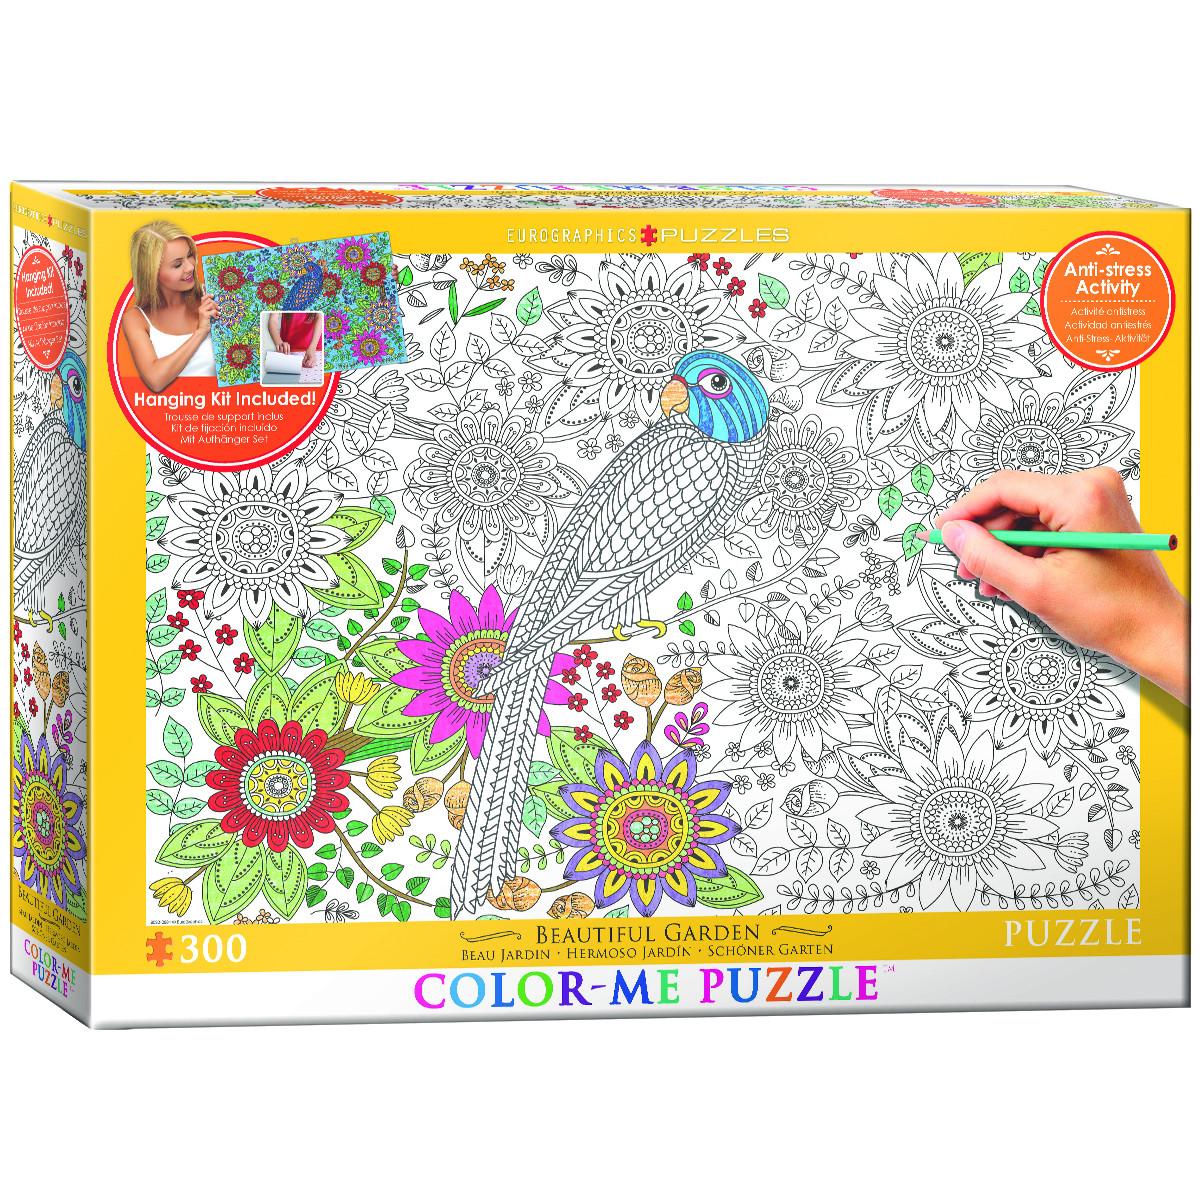 Beautiful Garden Coloring Puzzle | PuzzleWarehouse.com